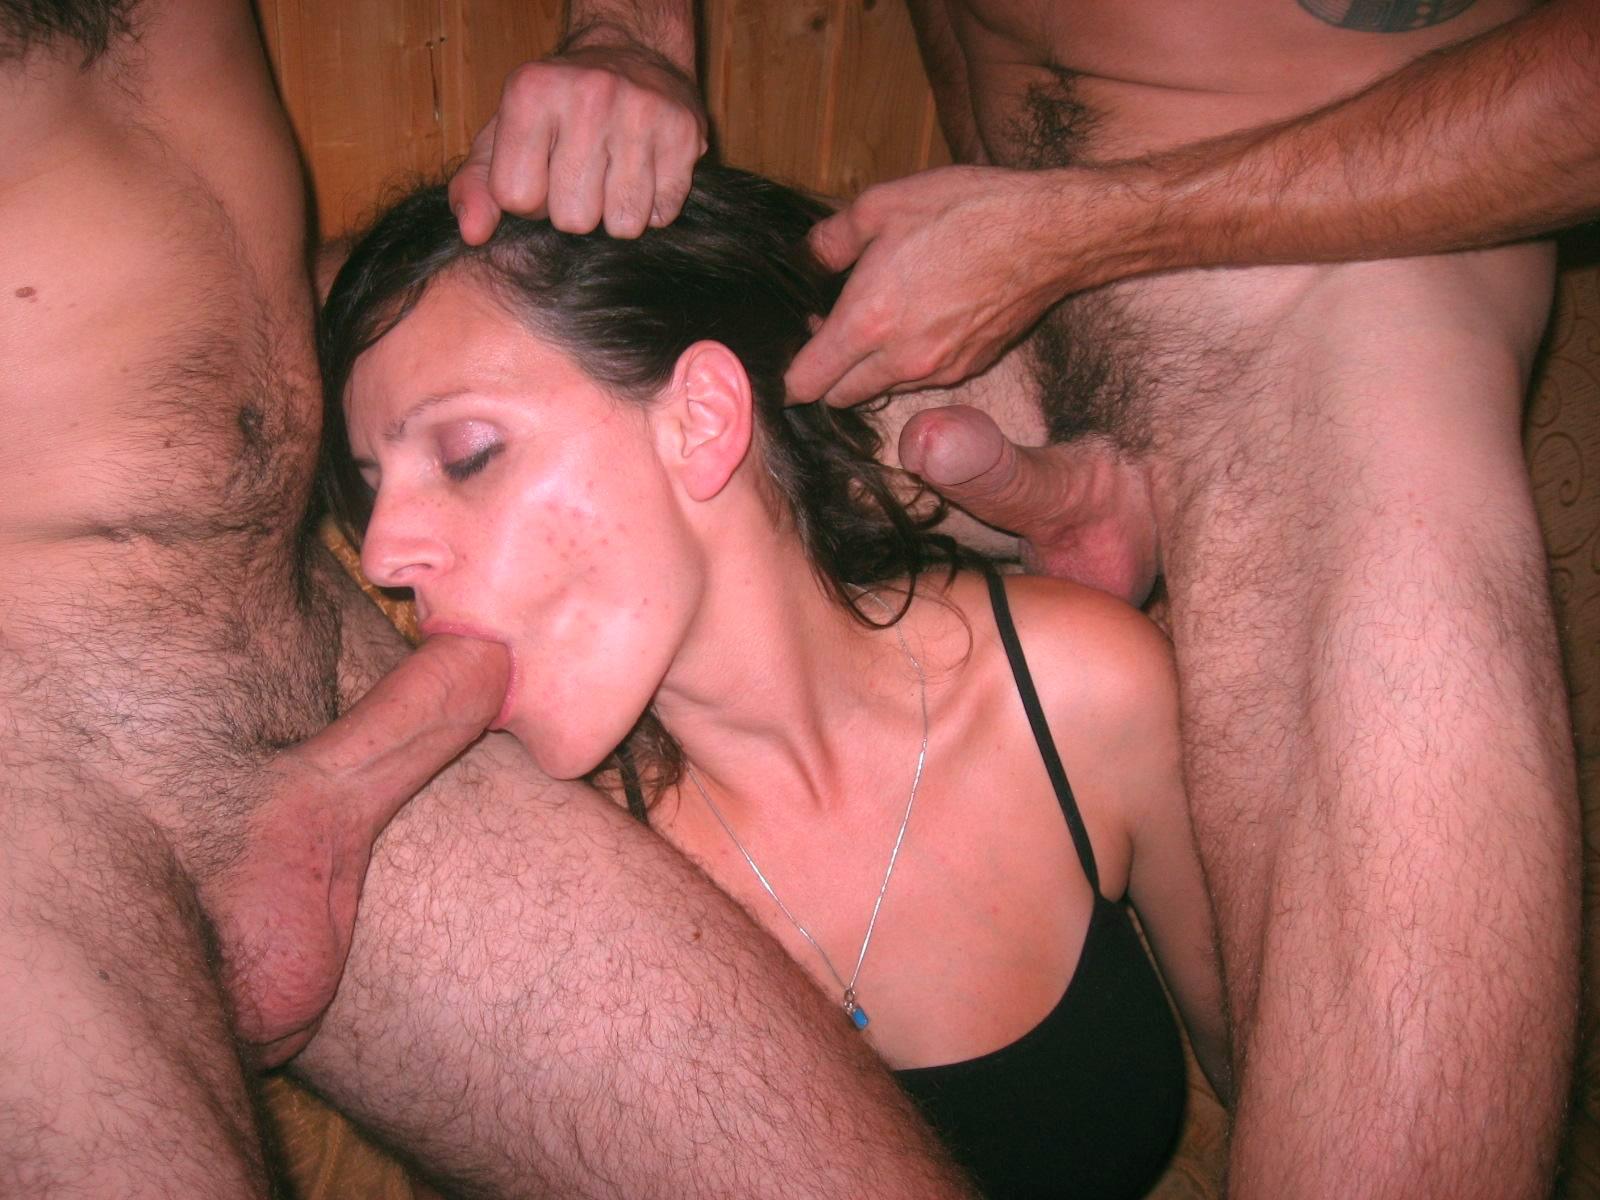 Домашний секс без презерватива перед камерой секс фото и порно фото